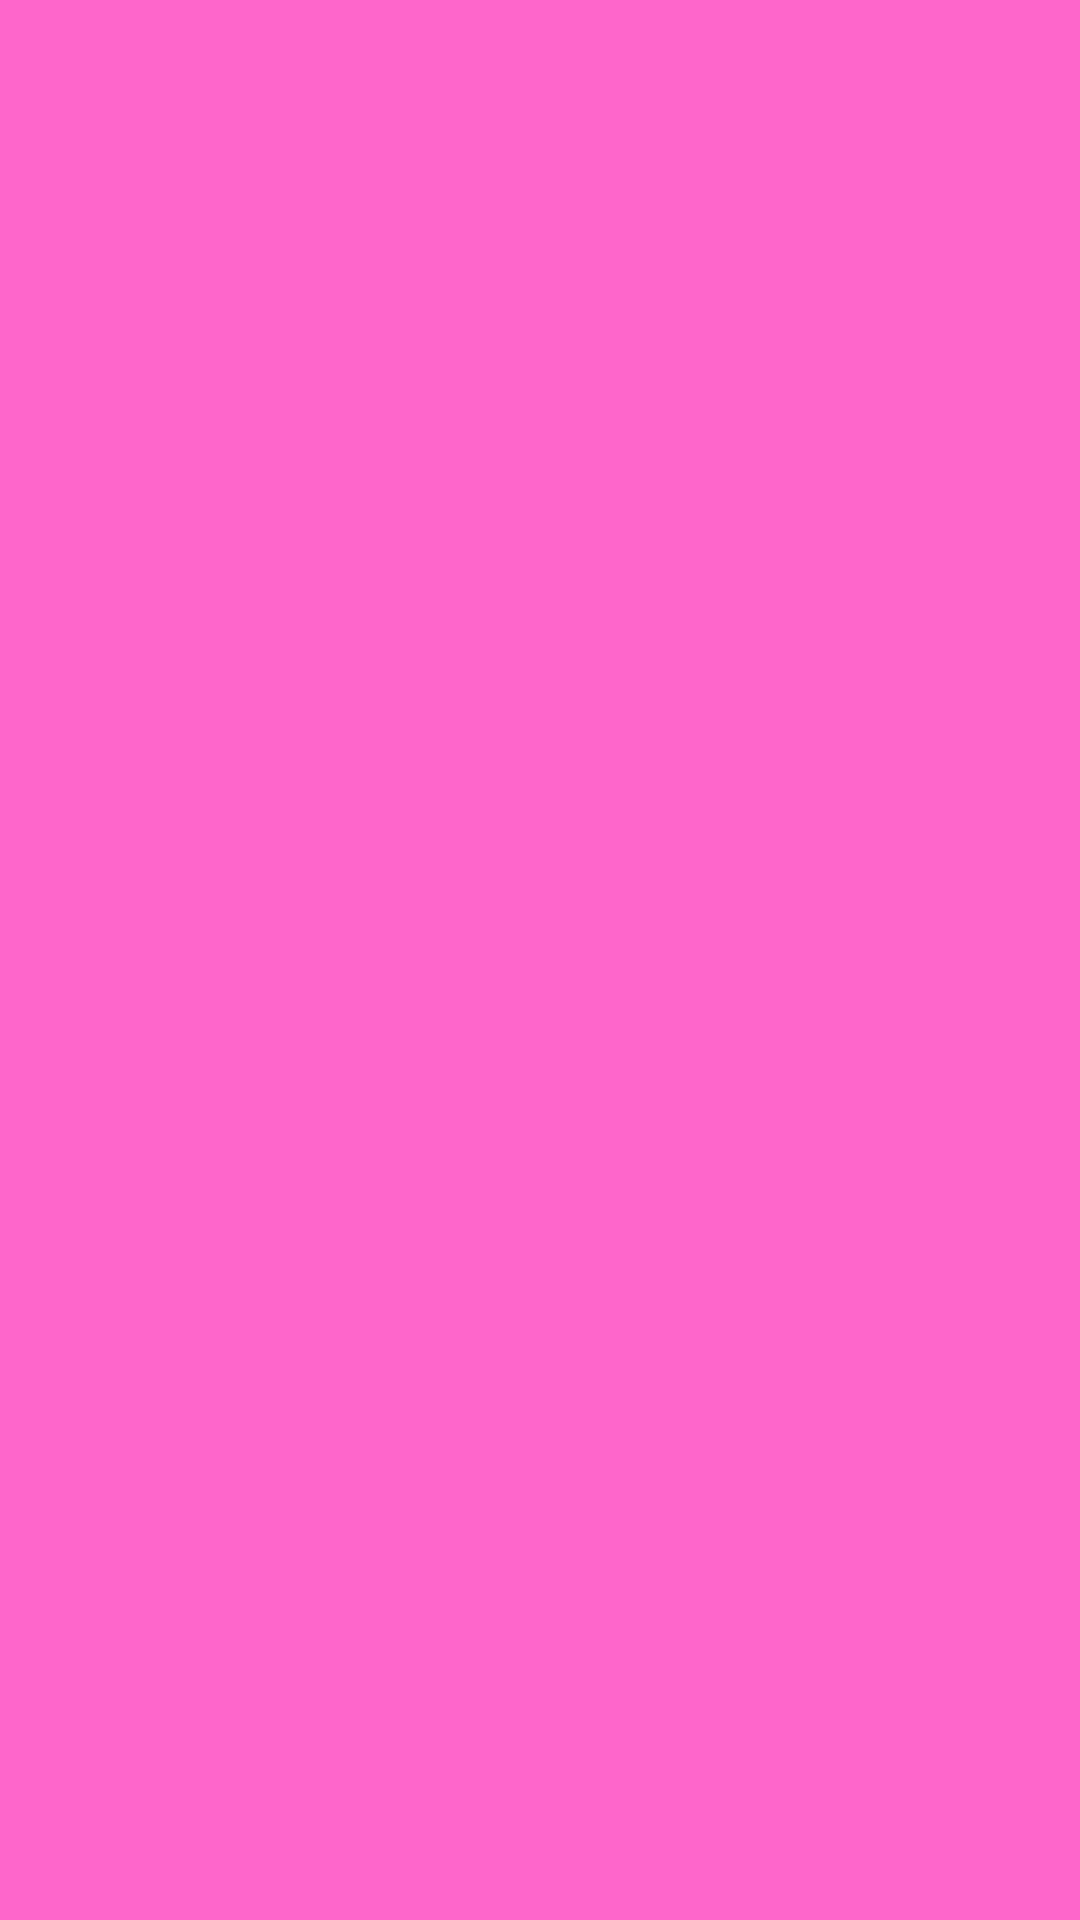 1080x1920 Rose Pink Solid Color Background